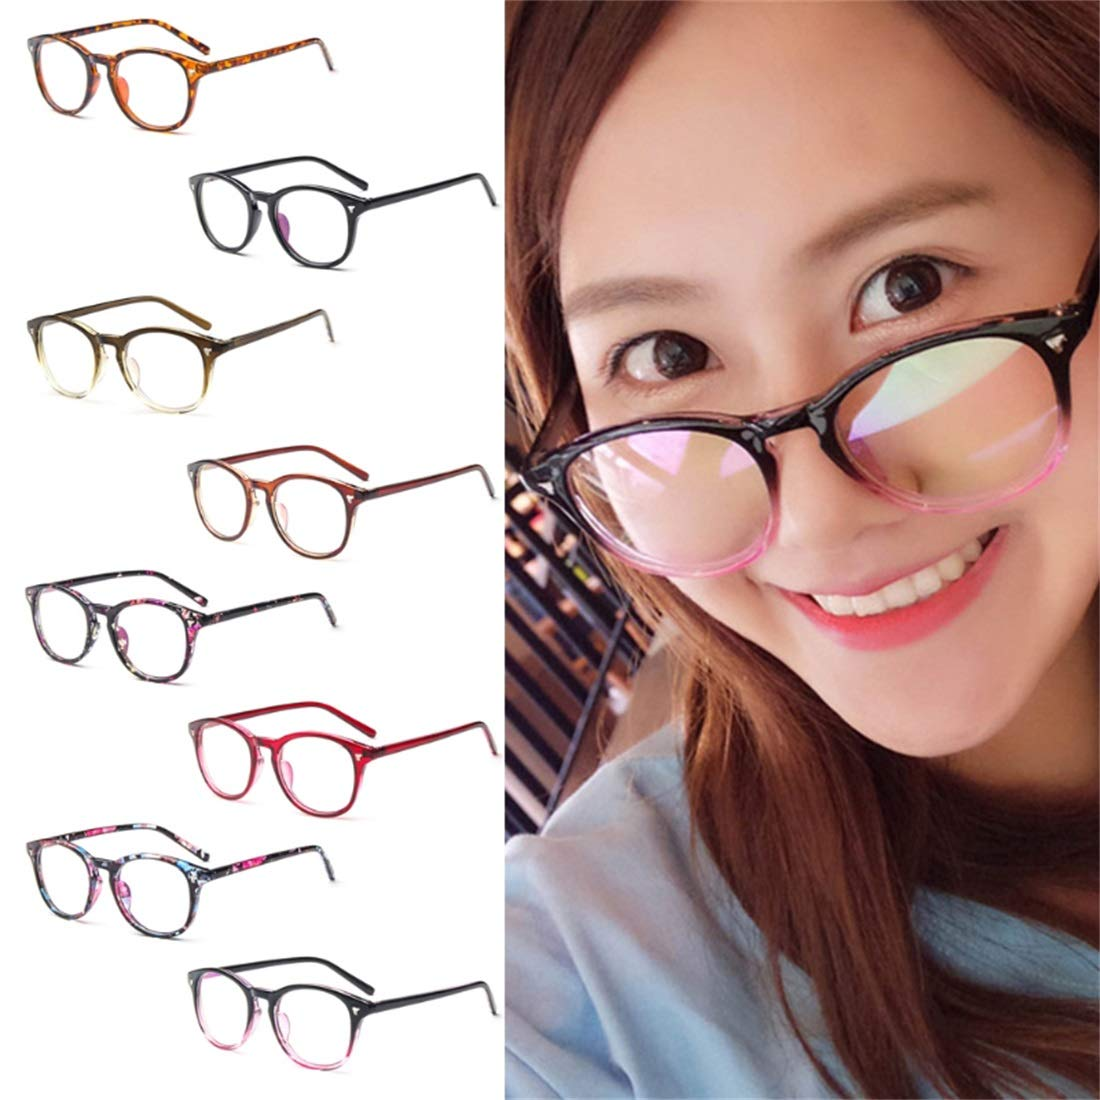 CHICLI Vintage Clear Lens Eyeglasses Frame Retro Men Women Unisex Glasses Optical A17/_40 03